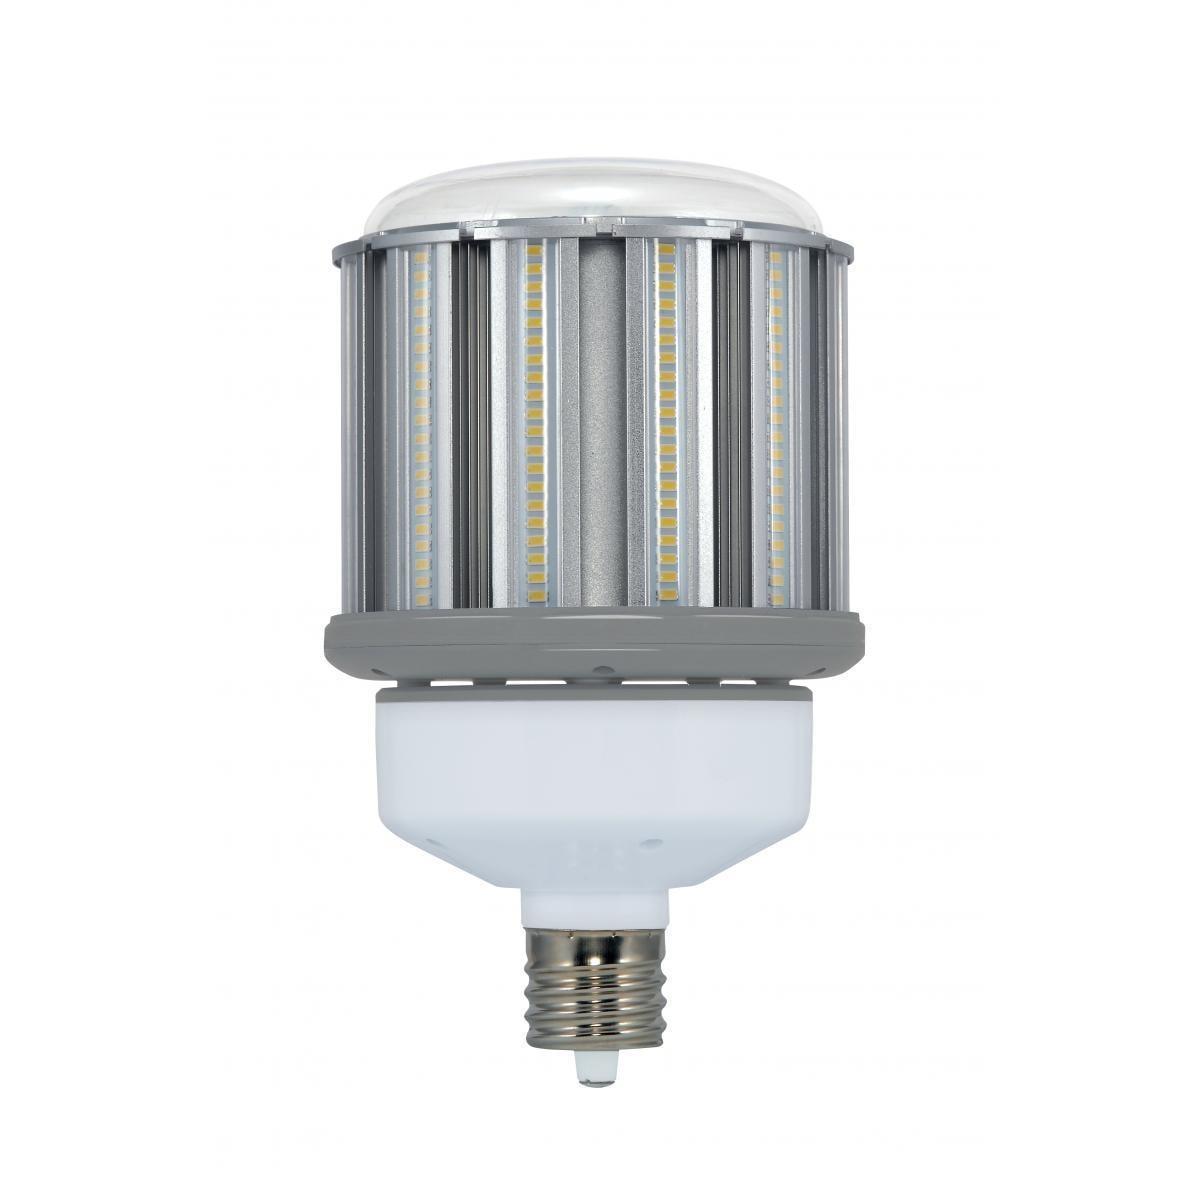 SATCO 80W Hi-Pro LED - HID Replacement - Mogul Base - 500...